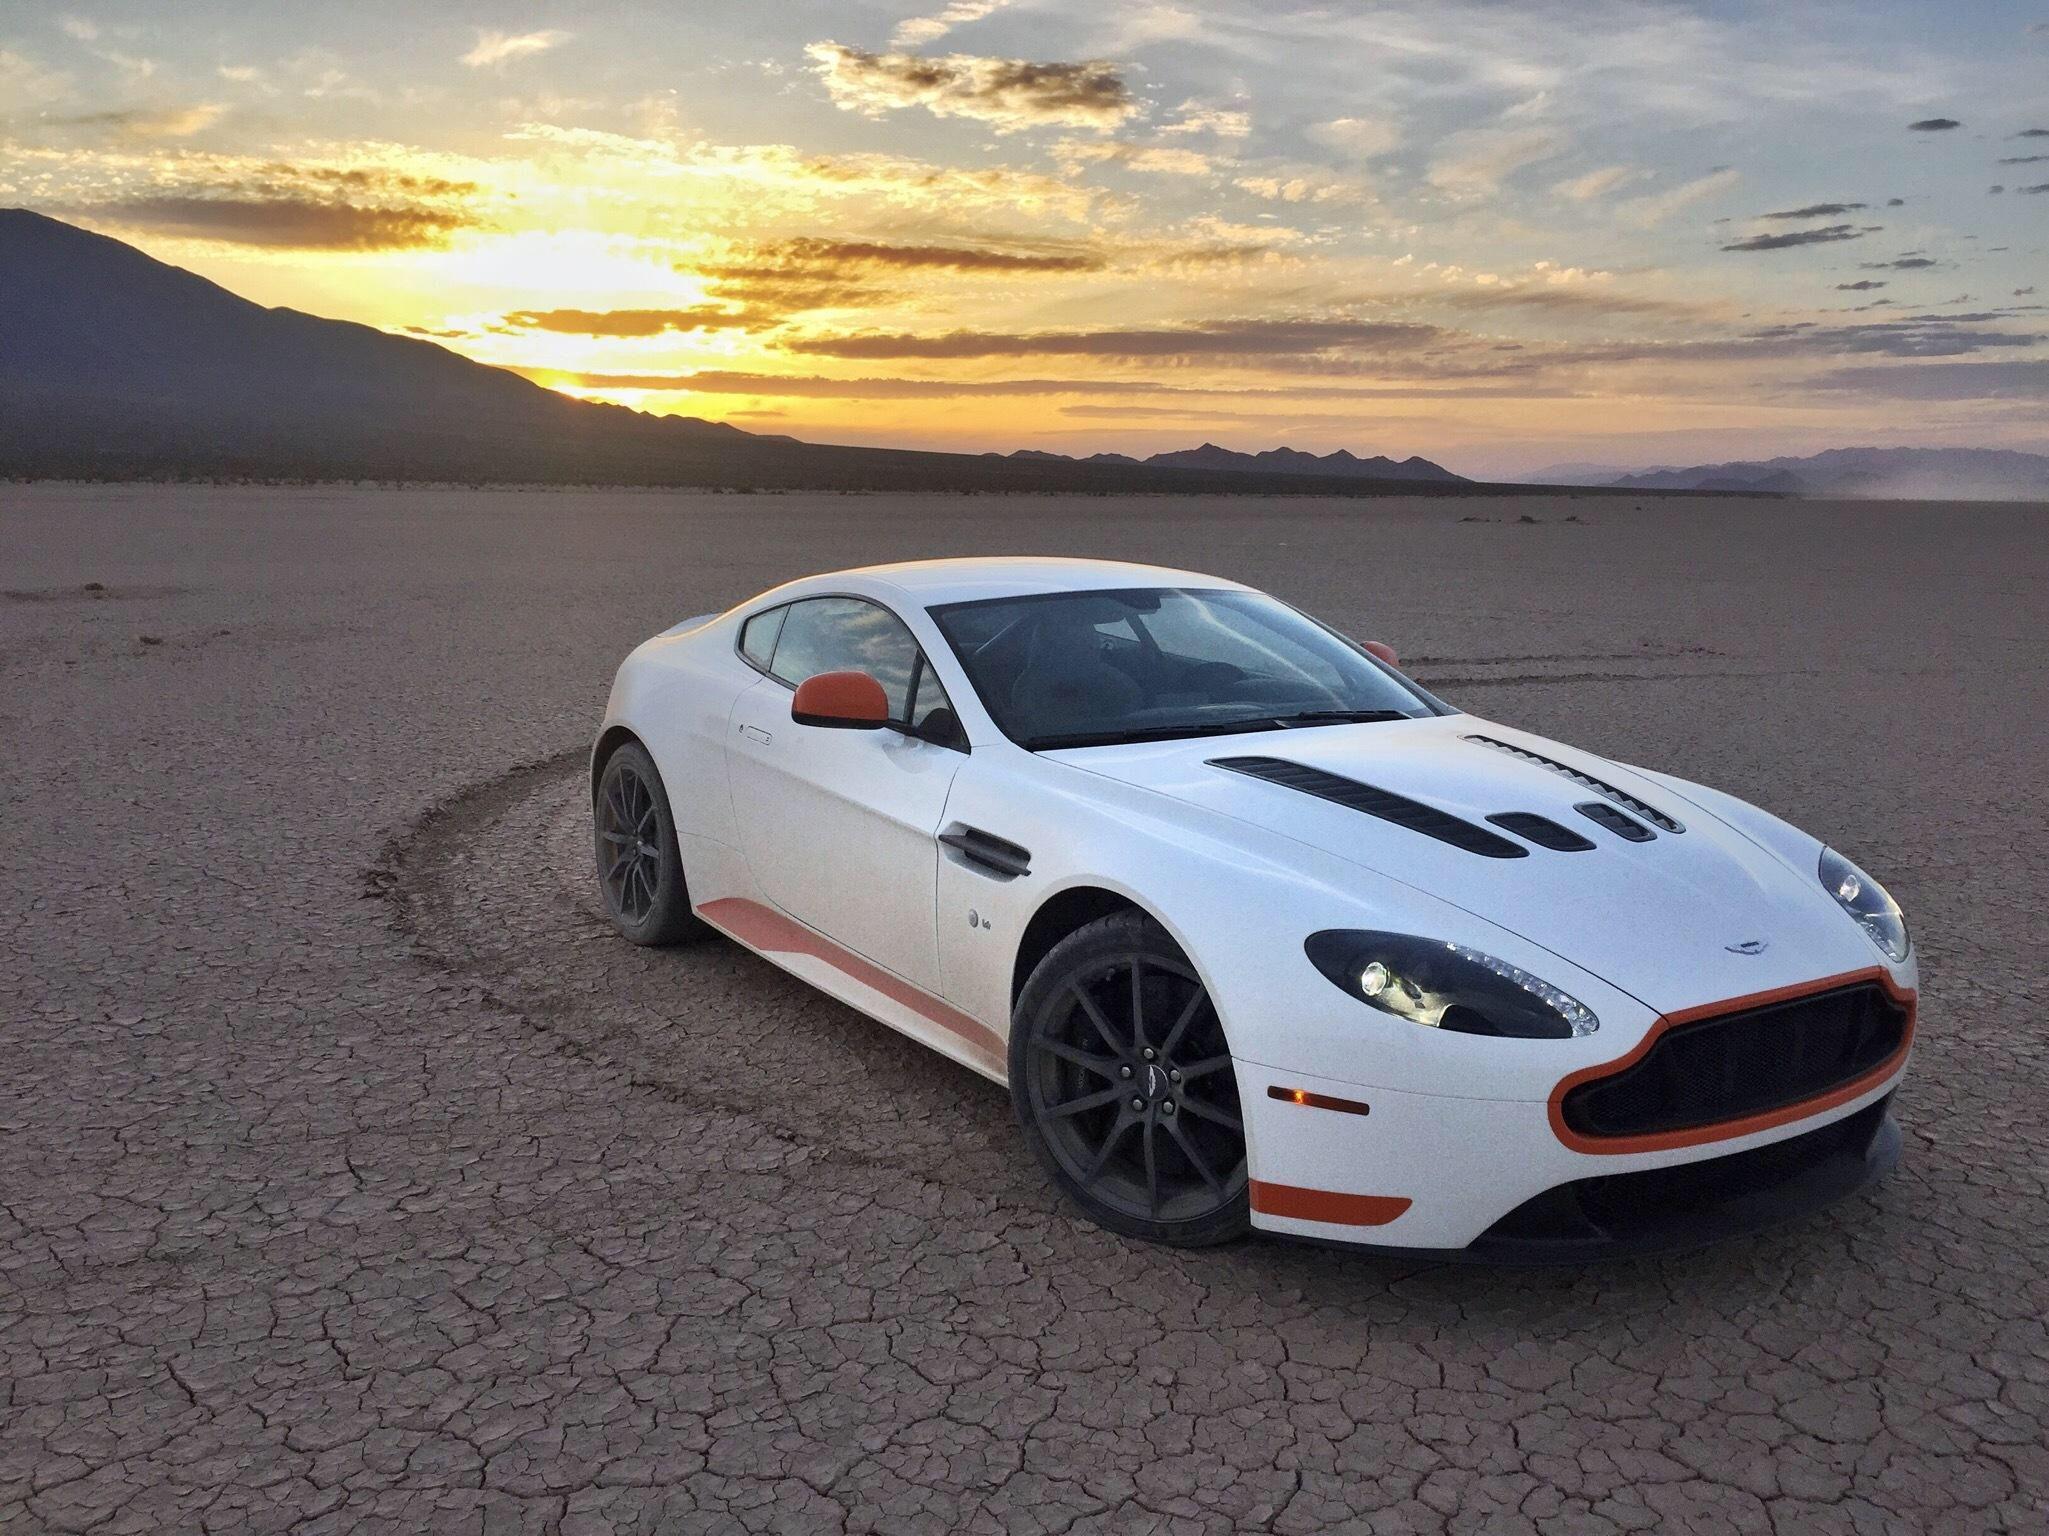 2017 Aston Martin V12 Vantage S Dogleg First Test Sports Car Vs